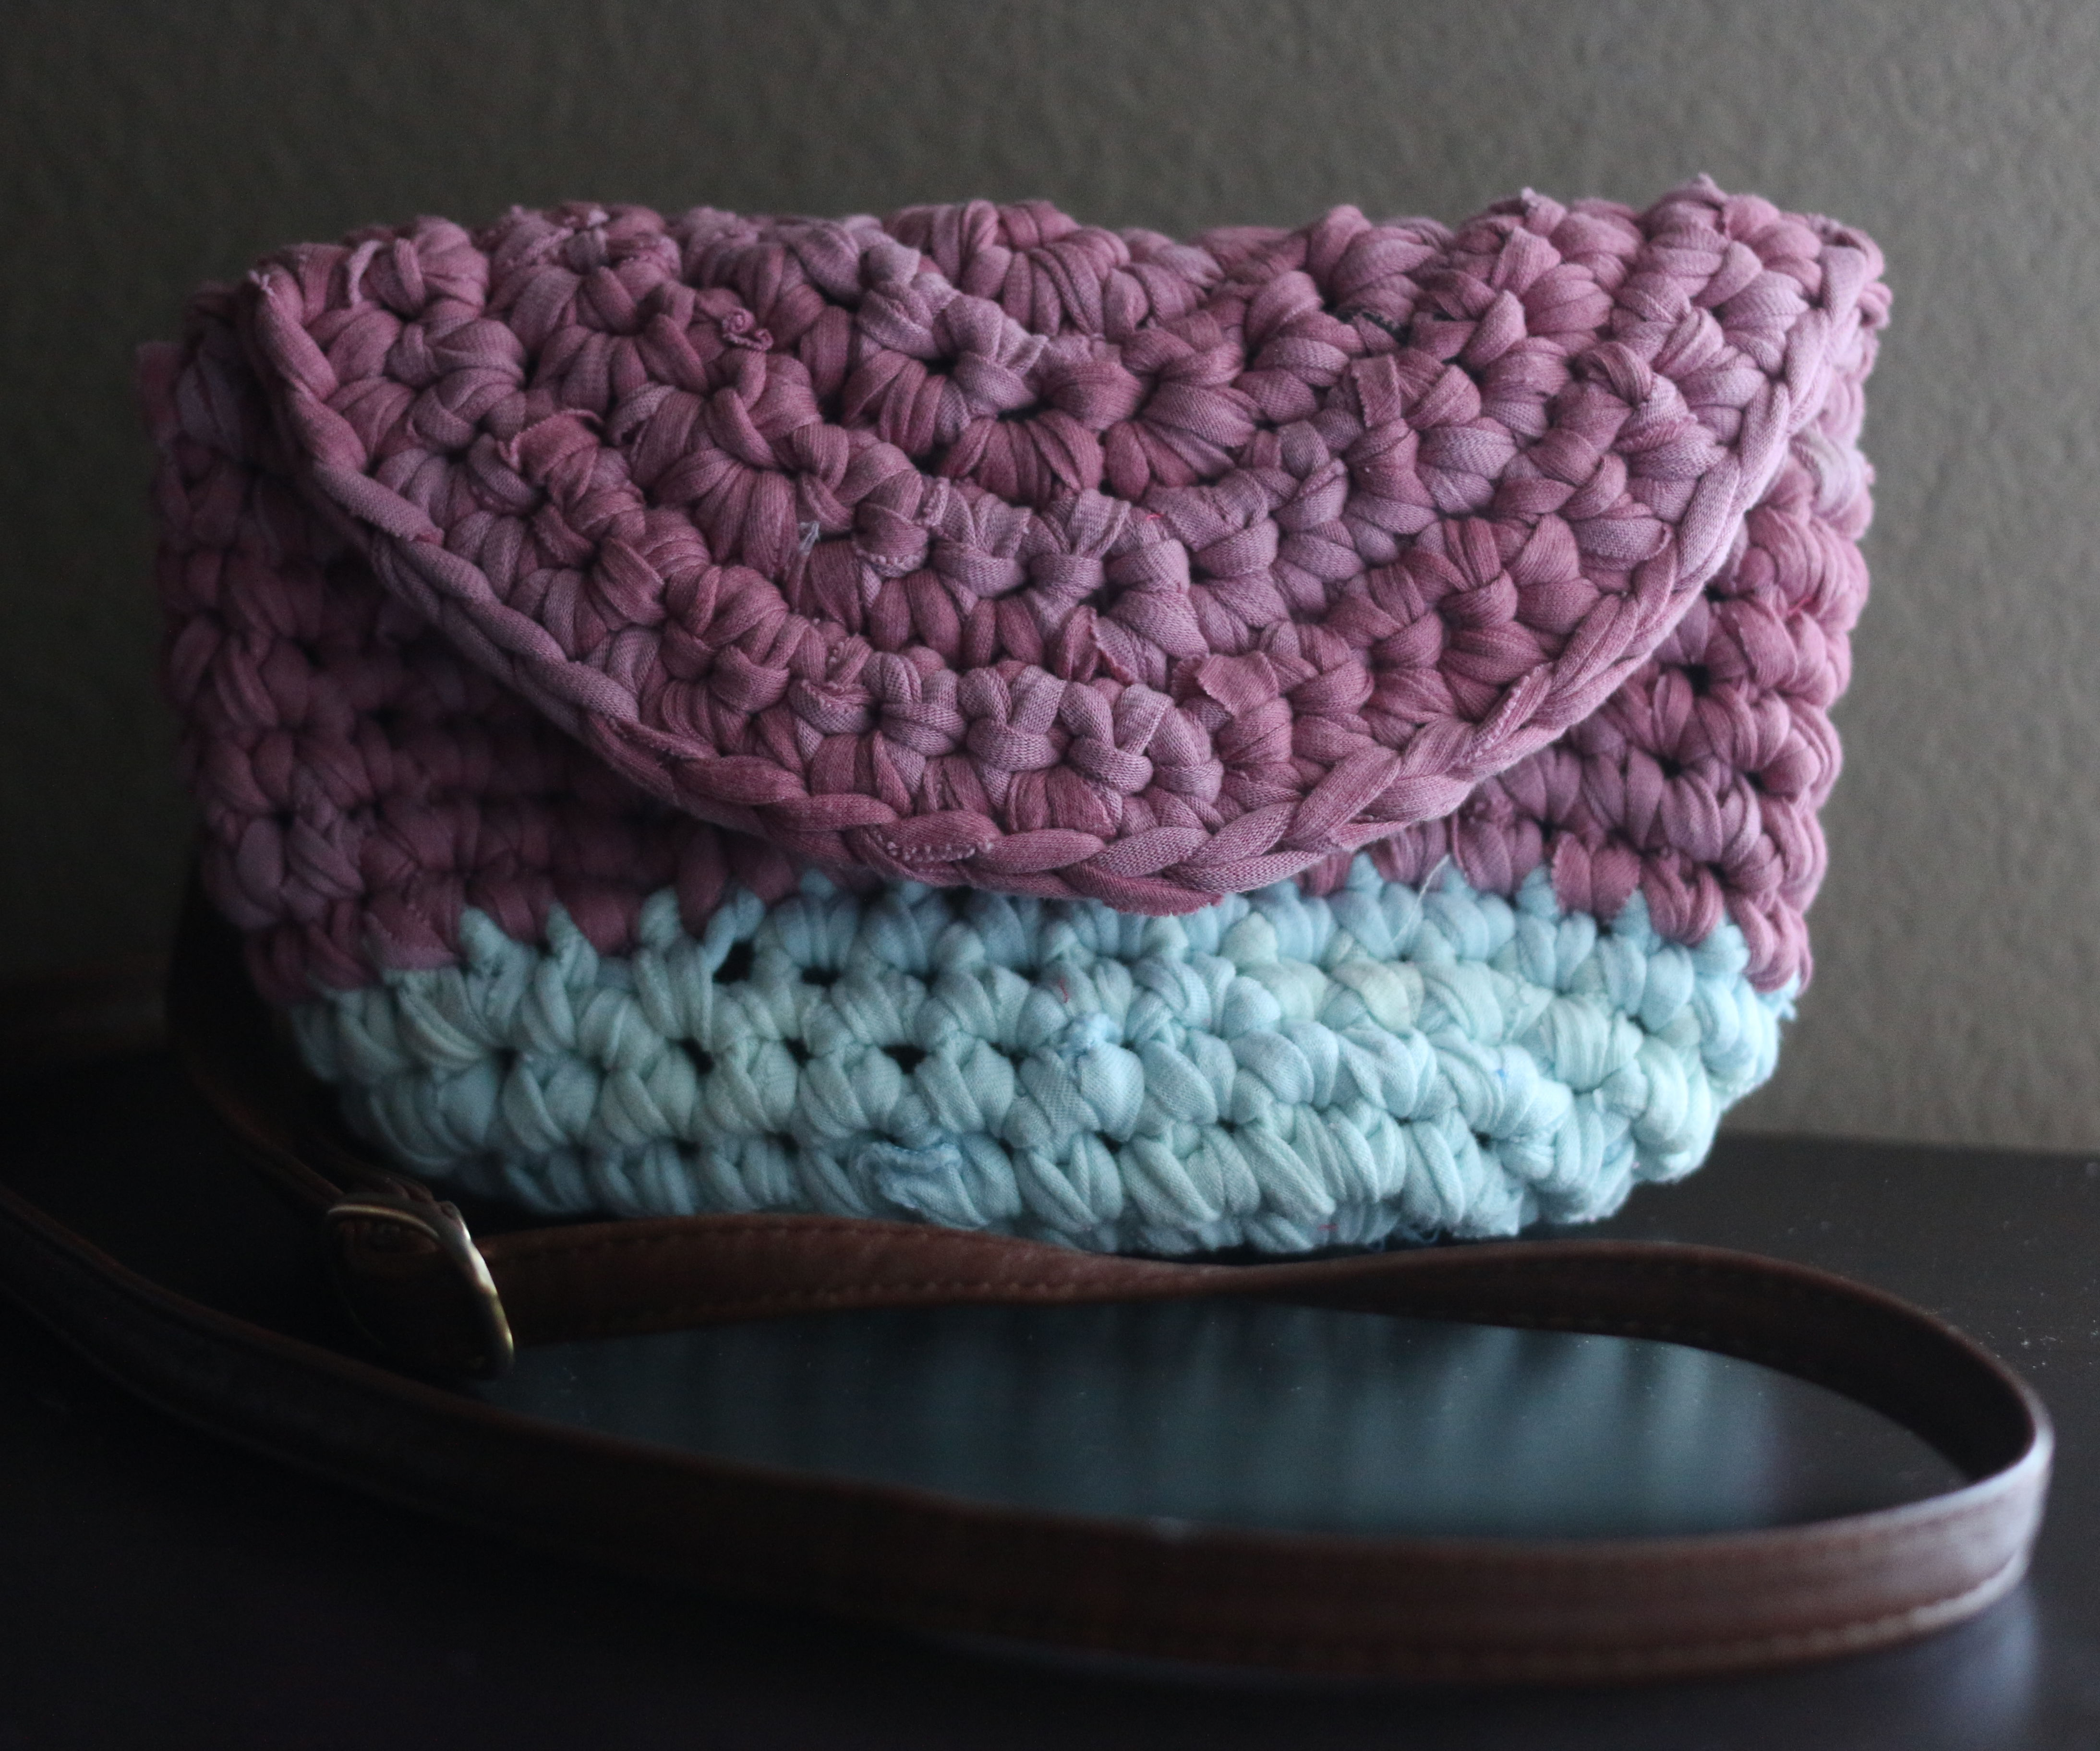 T-shirt Yarn Crocheted Crossbody Bag